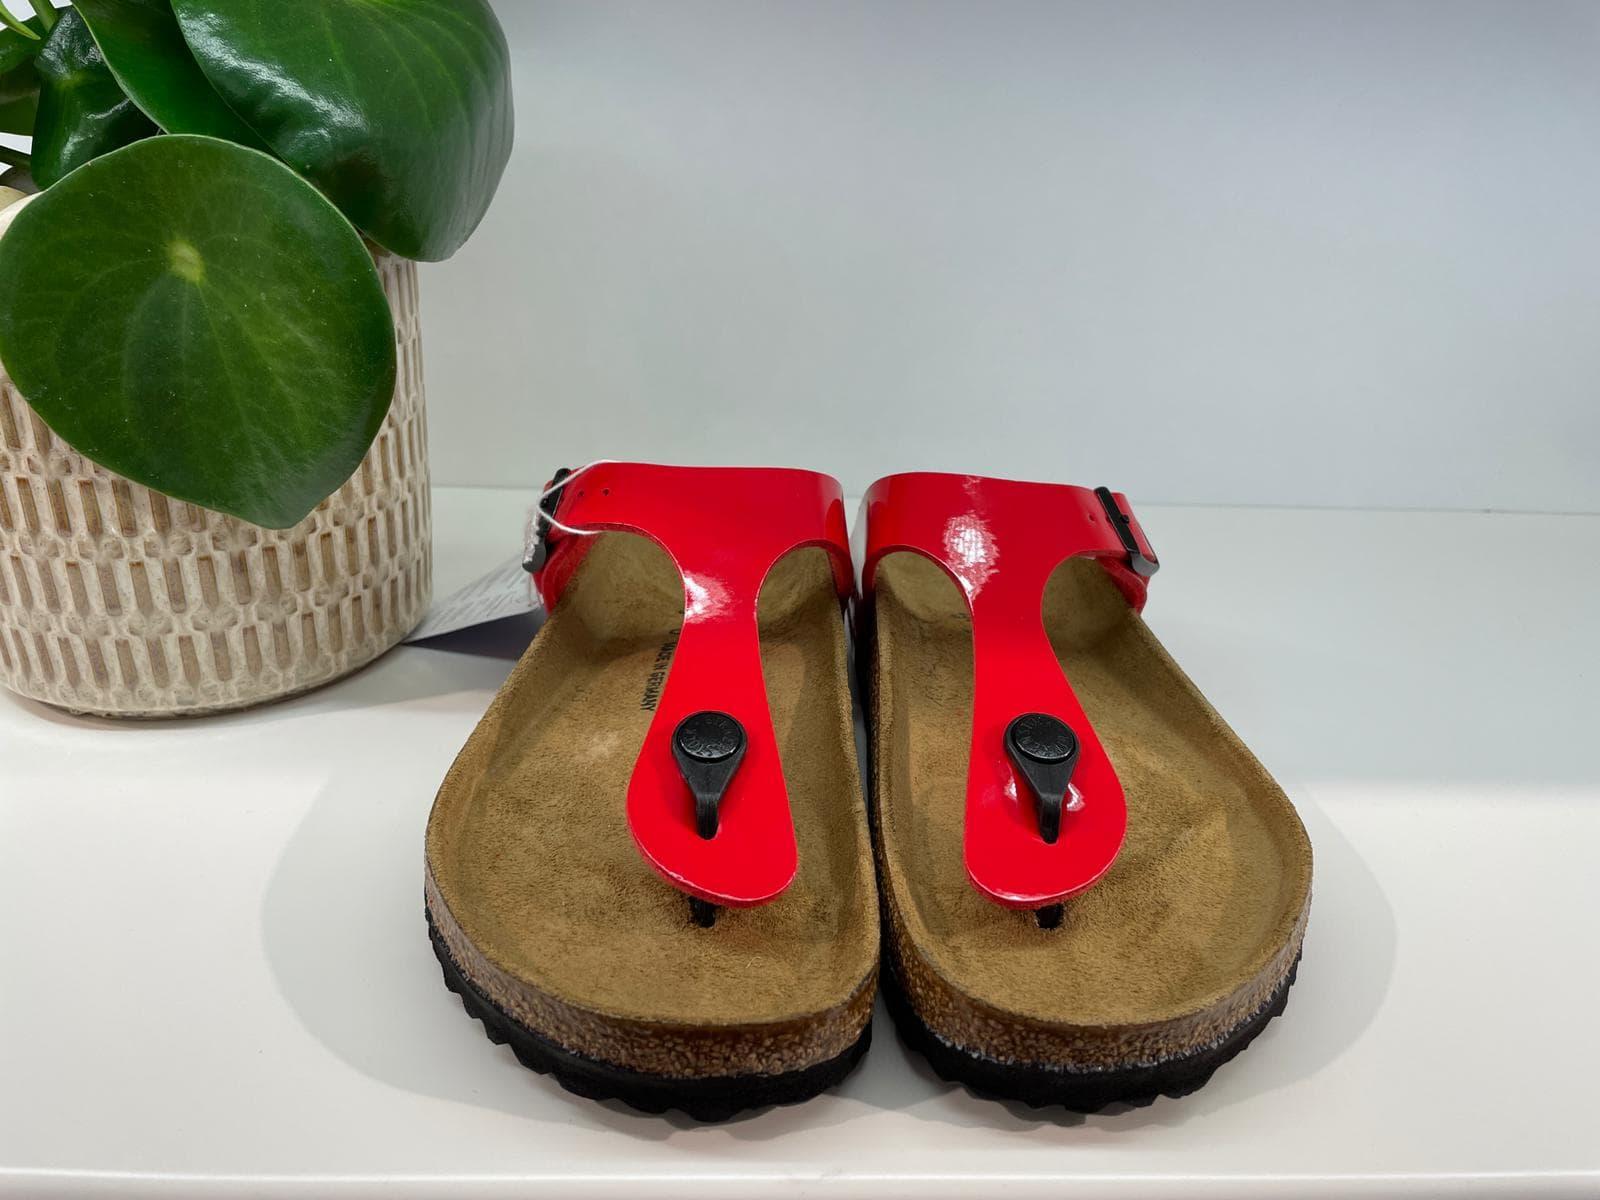 Birkenstock Sandalen mit Zehentrenner in rotem Lack